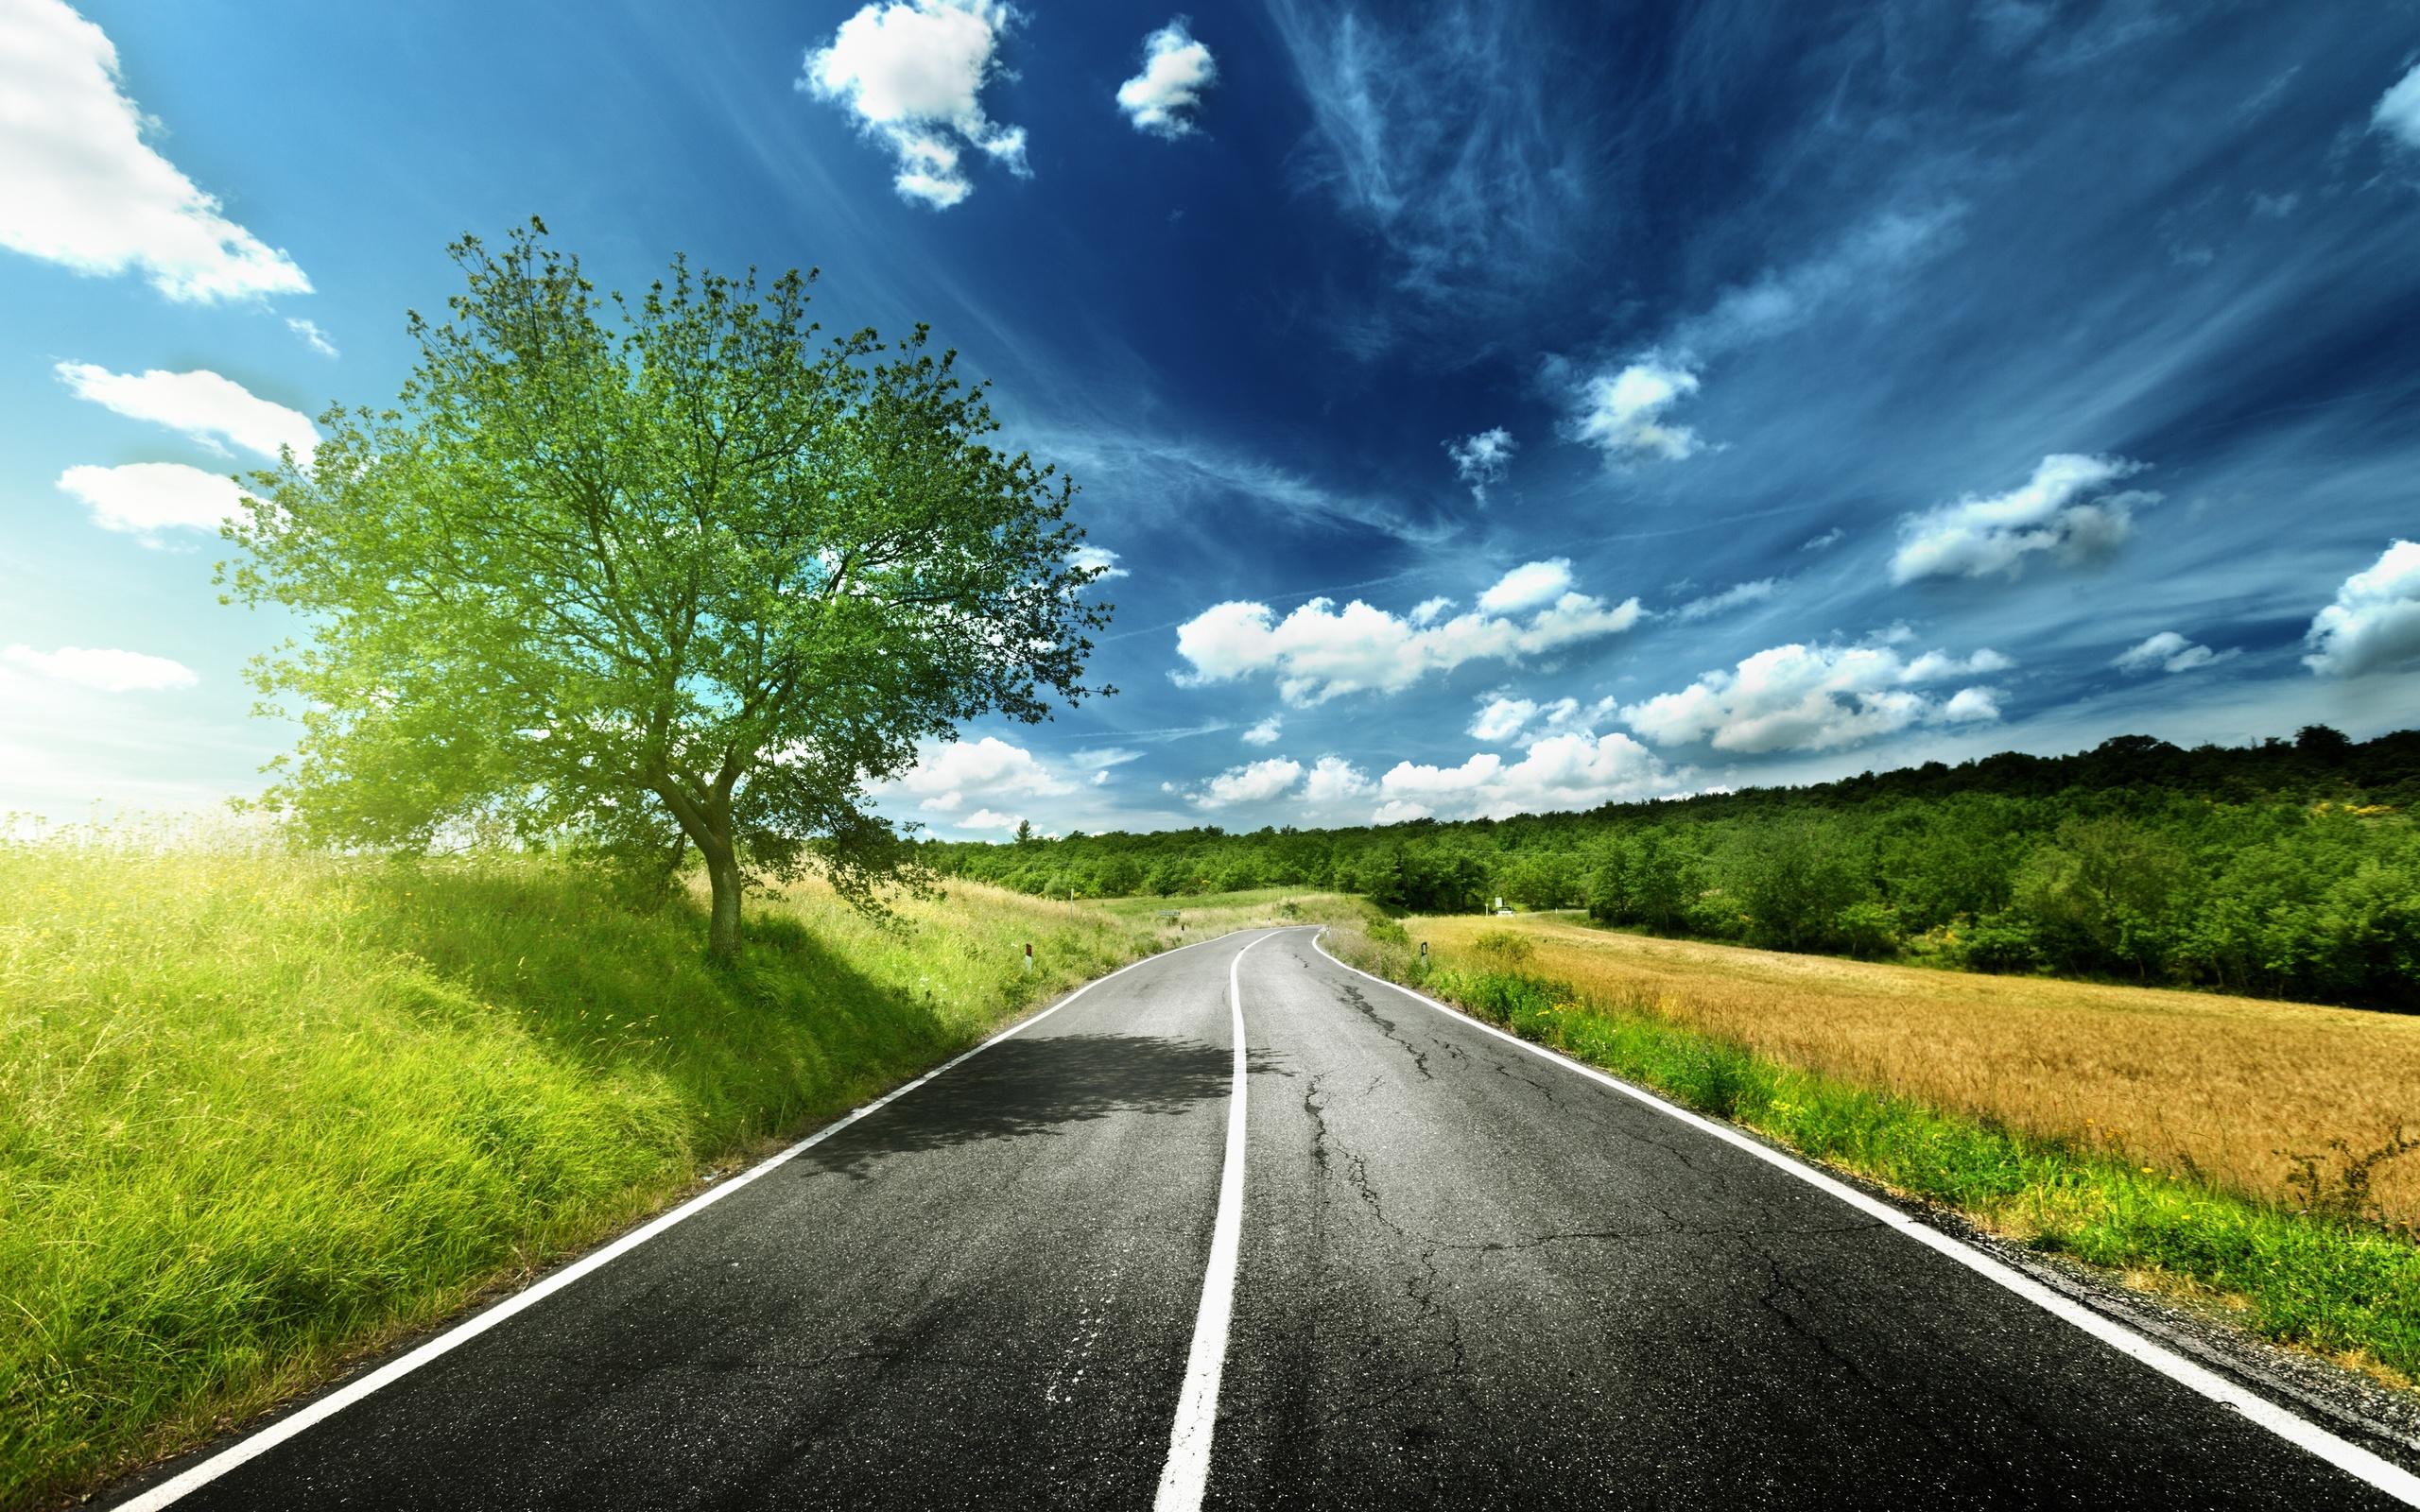 Hd Road Wallpapers 1080p 2560x1600 Wallpaper Teahub Io